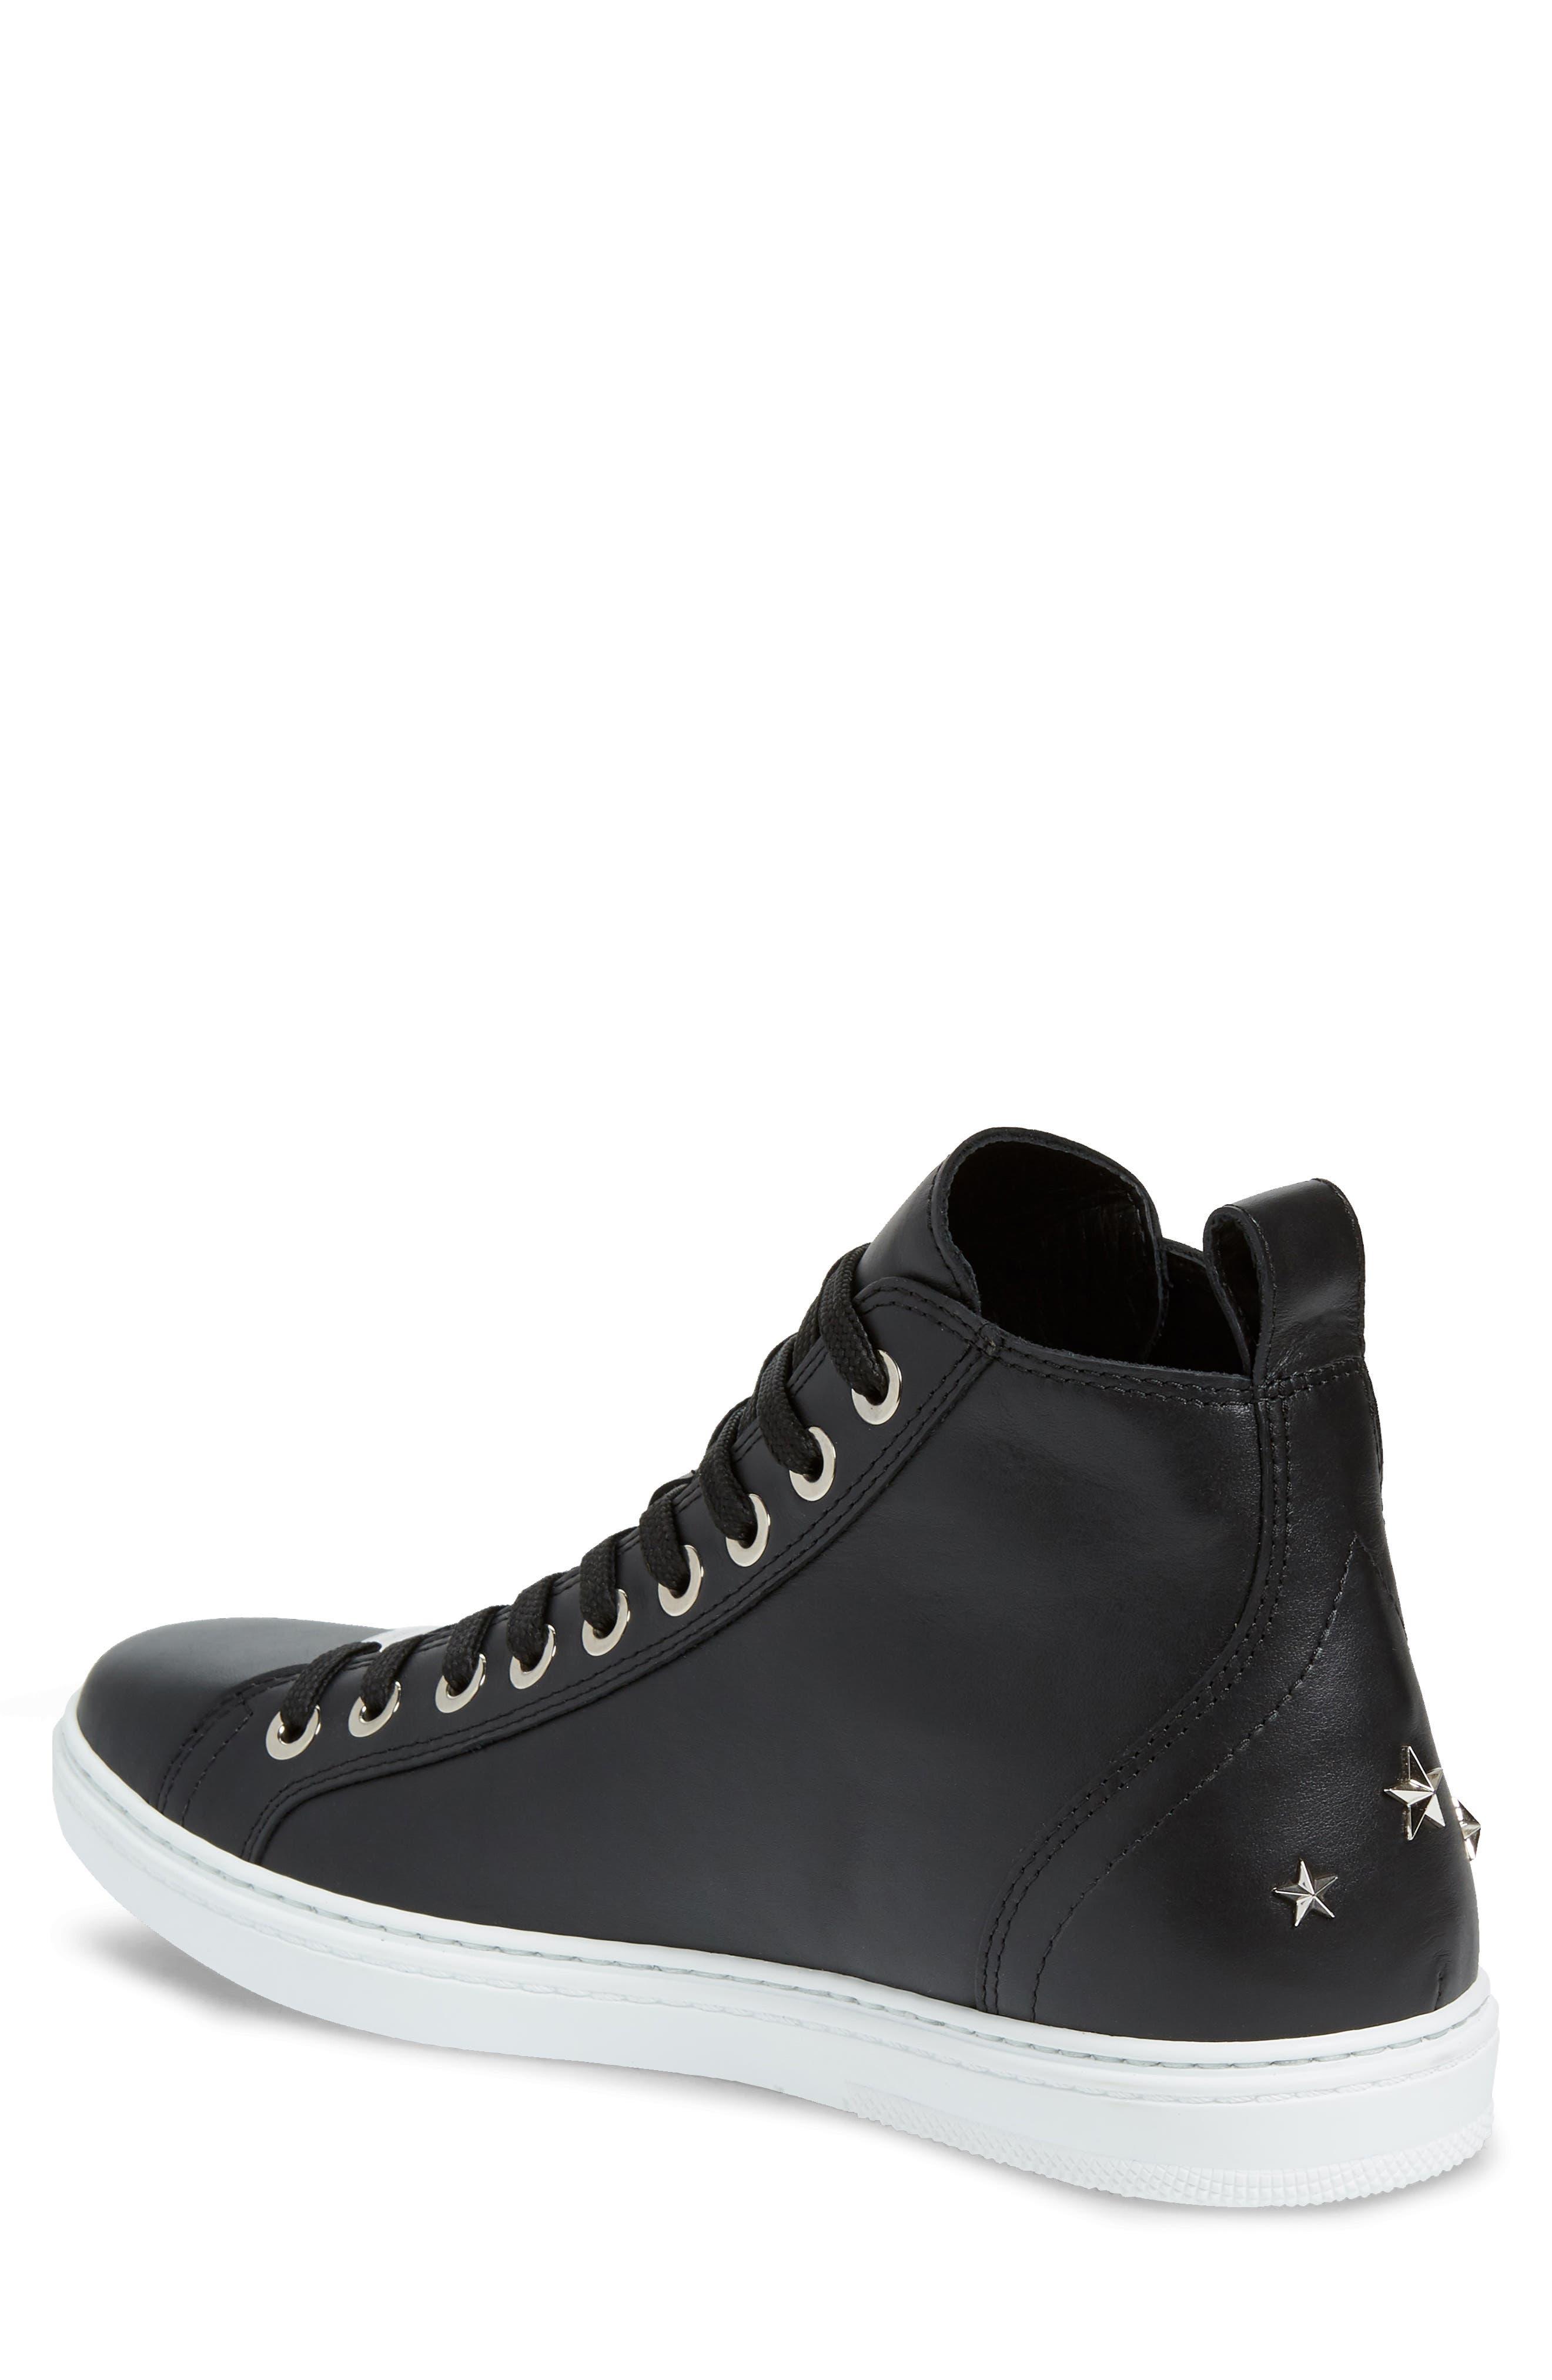 JIMMY CHOO, Colt High Top Sneaker, Alternate thumbnail 2, color, BLACK